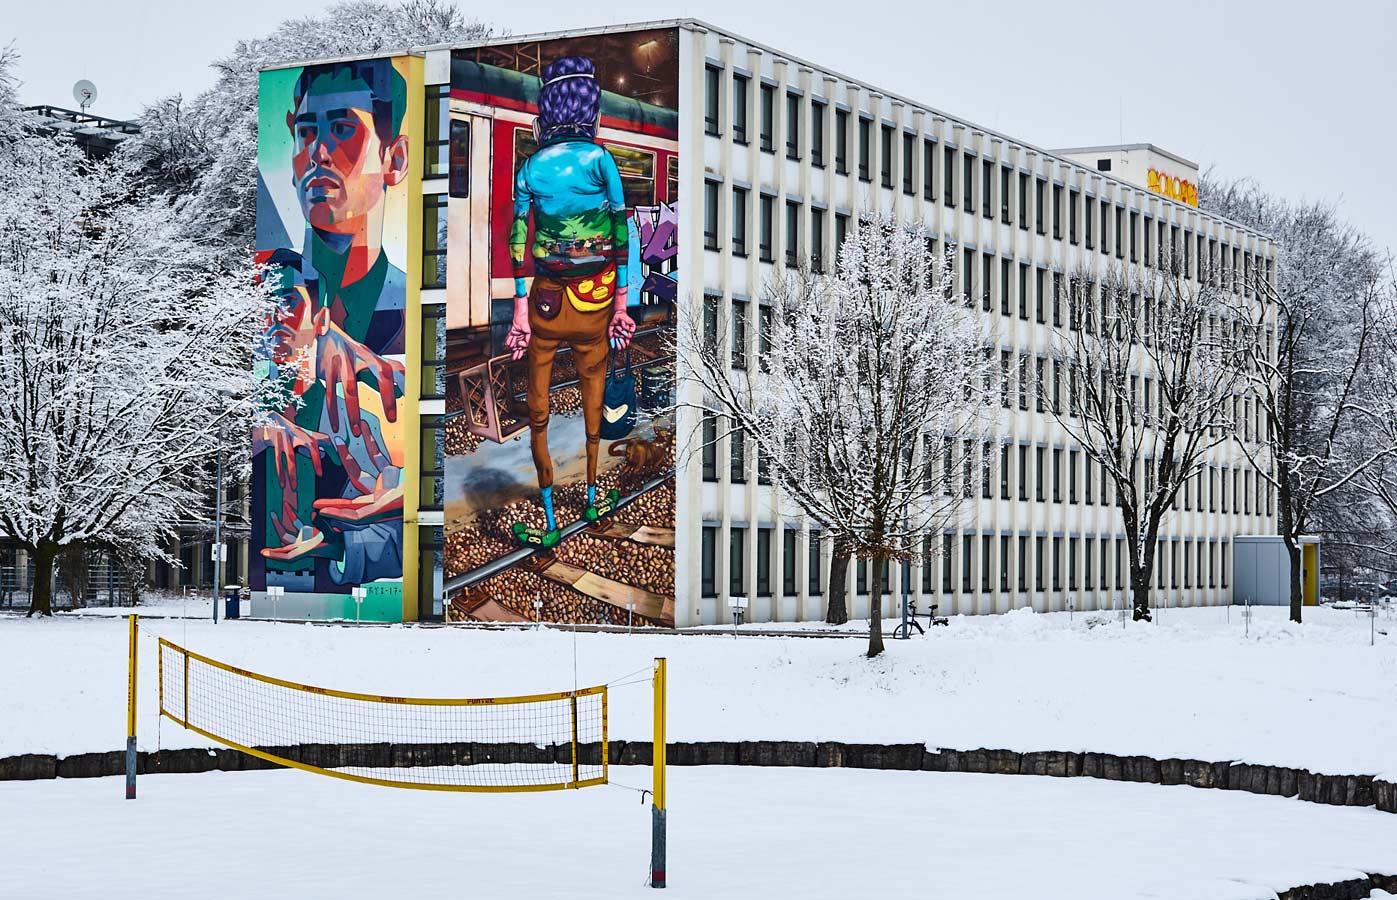 Scale-Street-Art-Siemens-Gelaende-Muenchen-2017--5